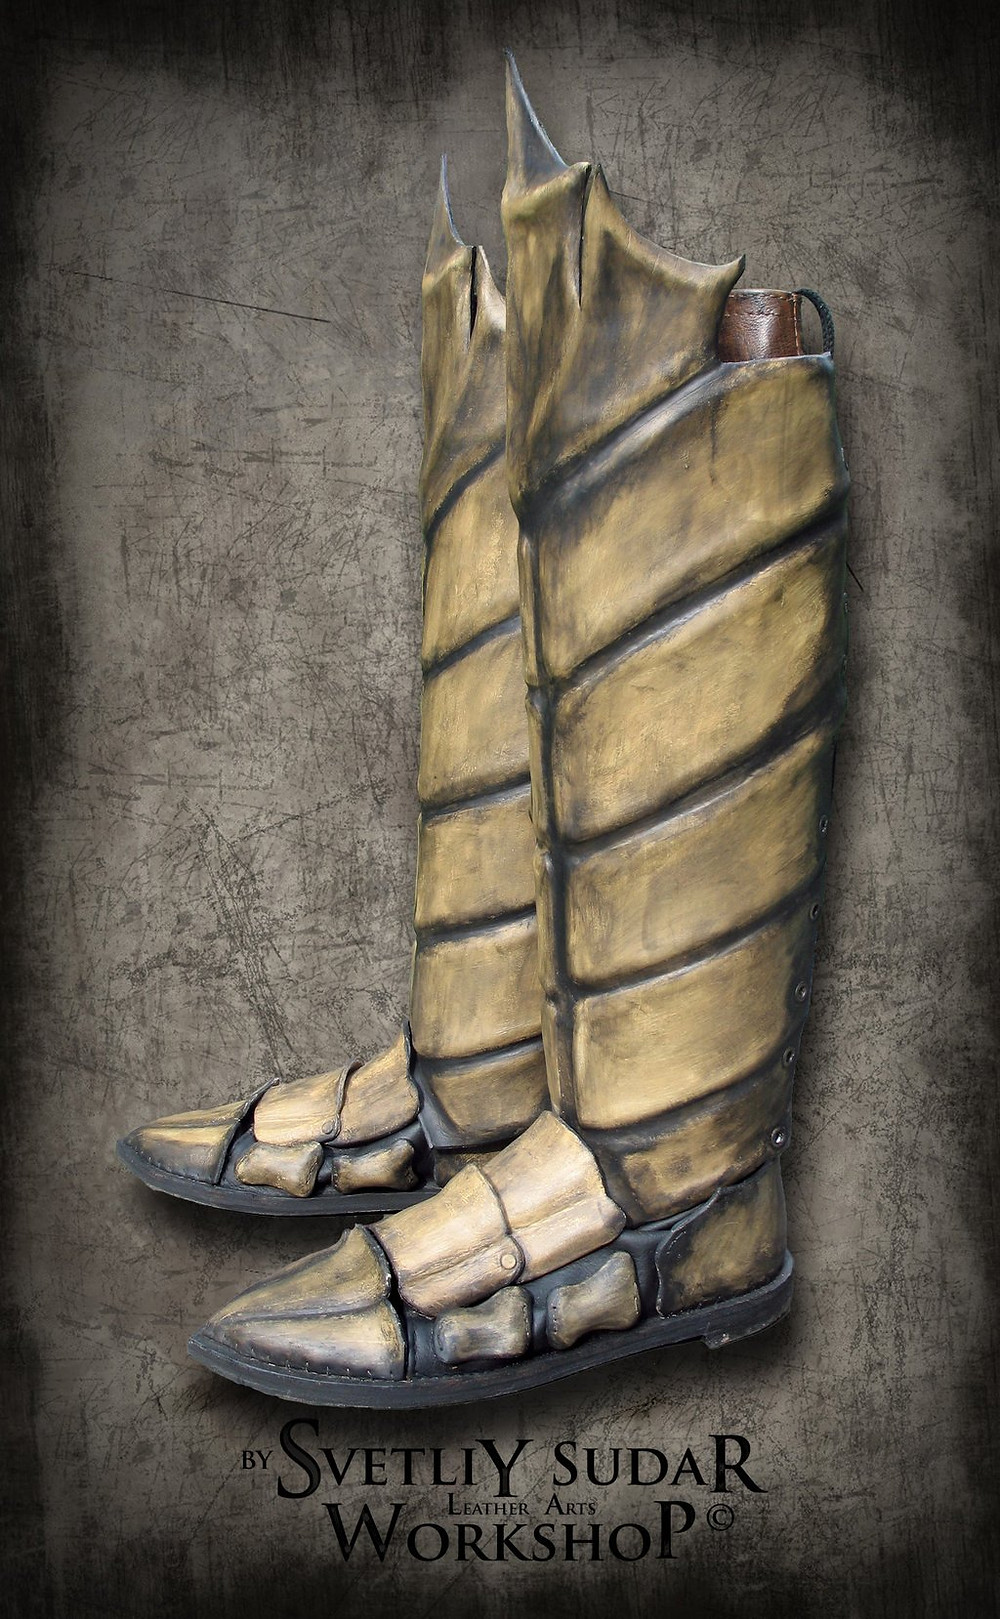 leather_boots_of_bone_warden_by_svetliy_sudar-d7z9eqy